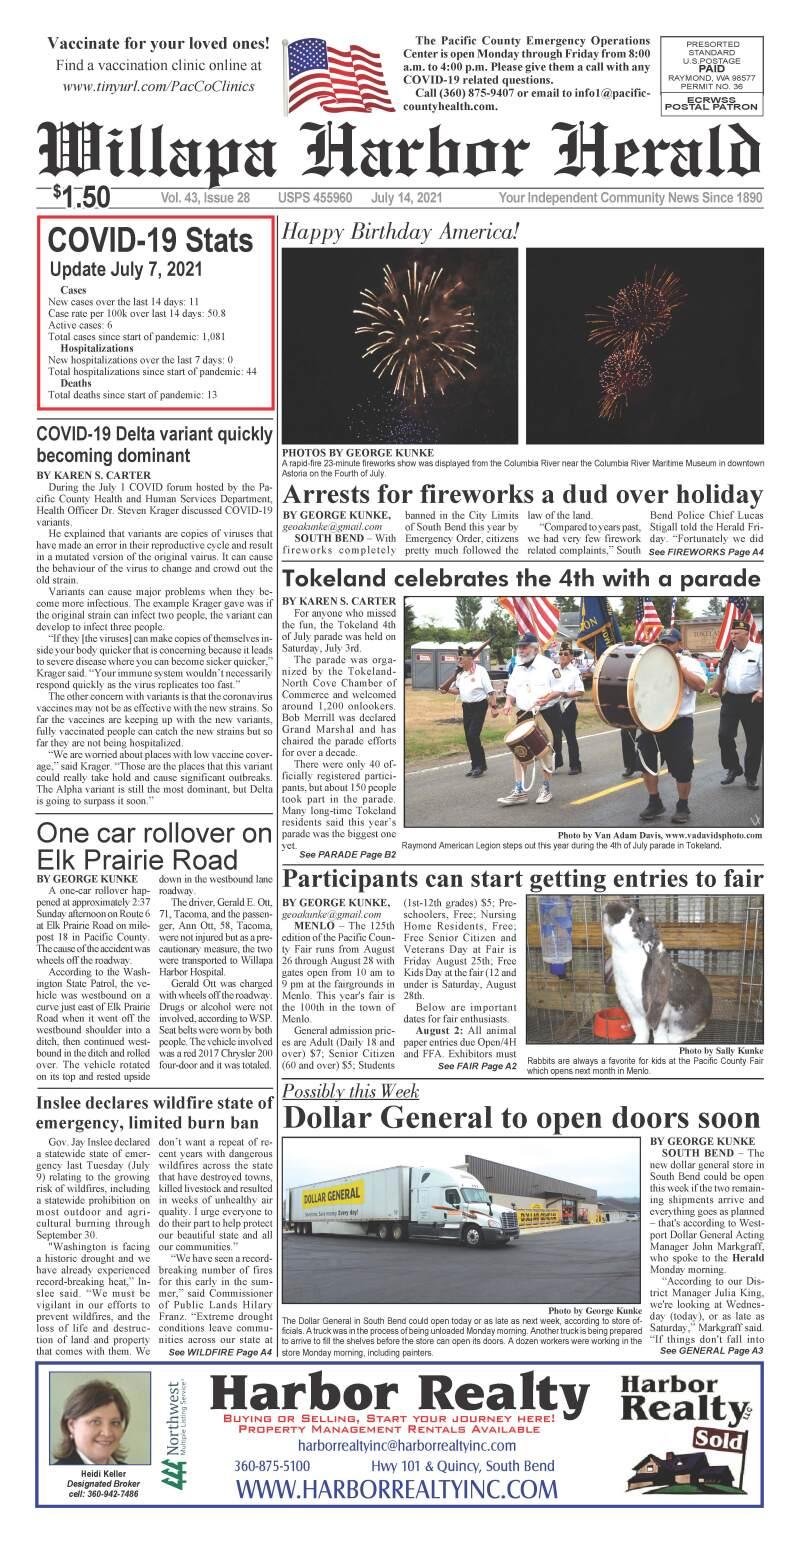 Jul 14, 2021 Willapa Harbor Herald and Pacific County Press